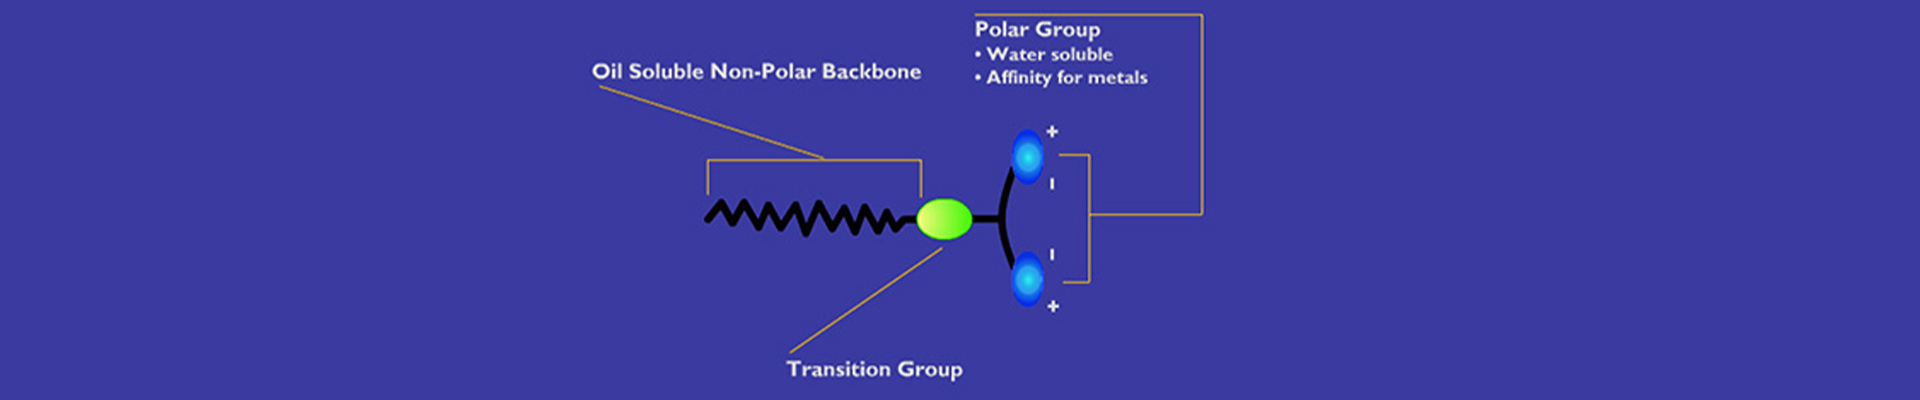 CorroxionX Polar Group